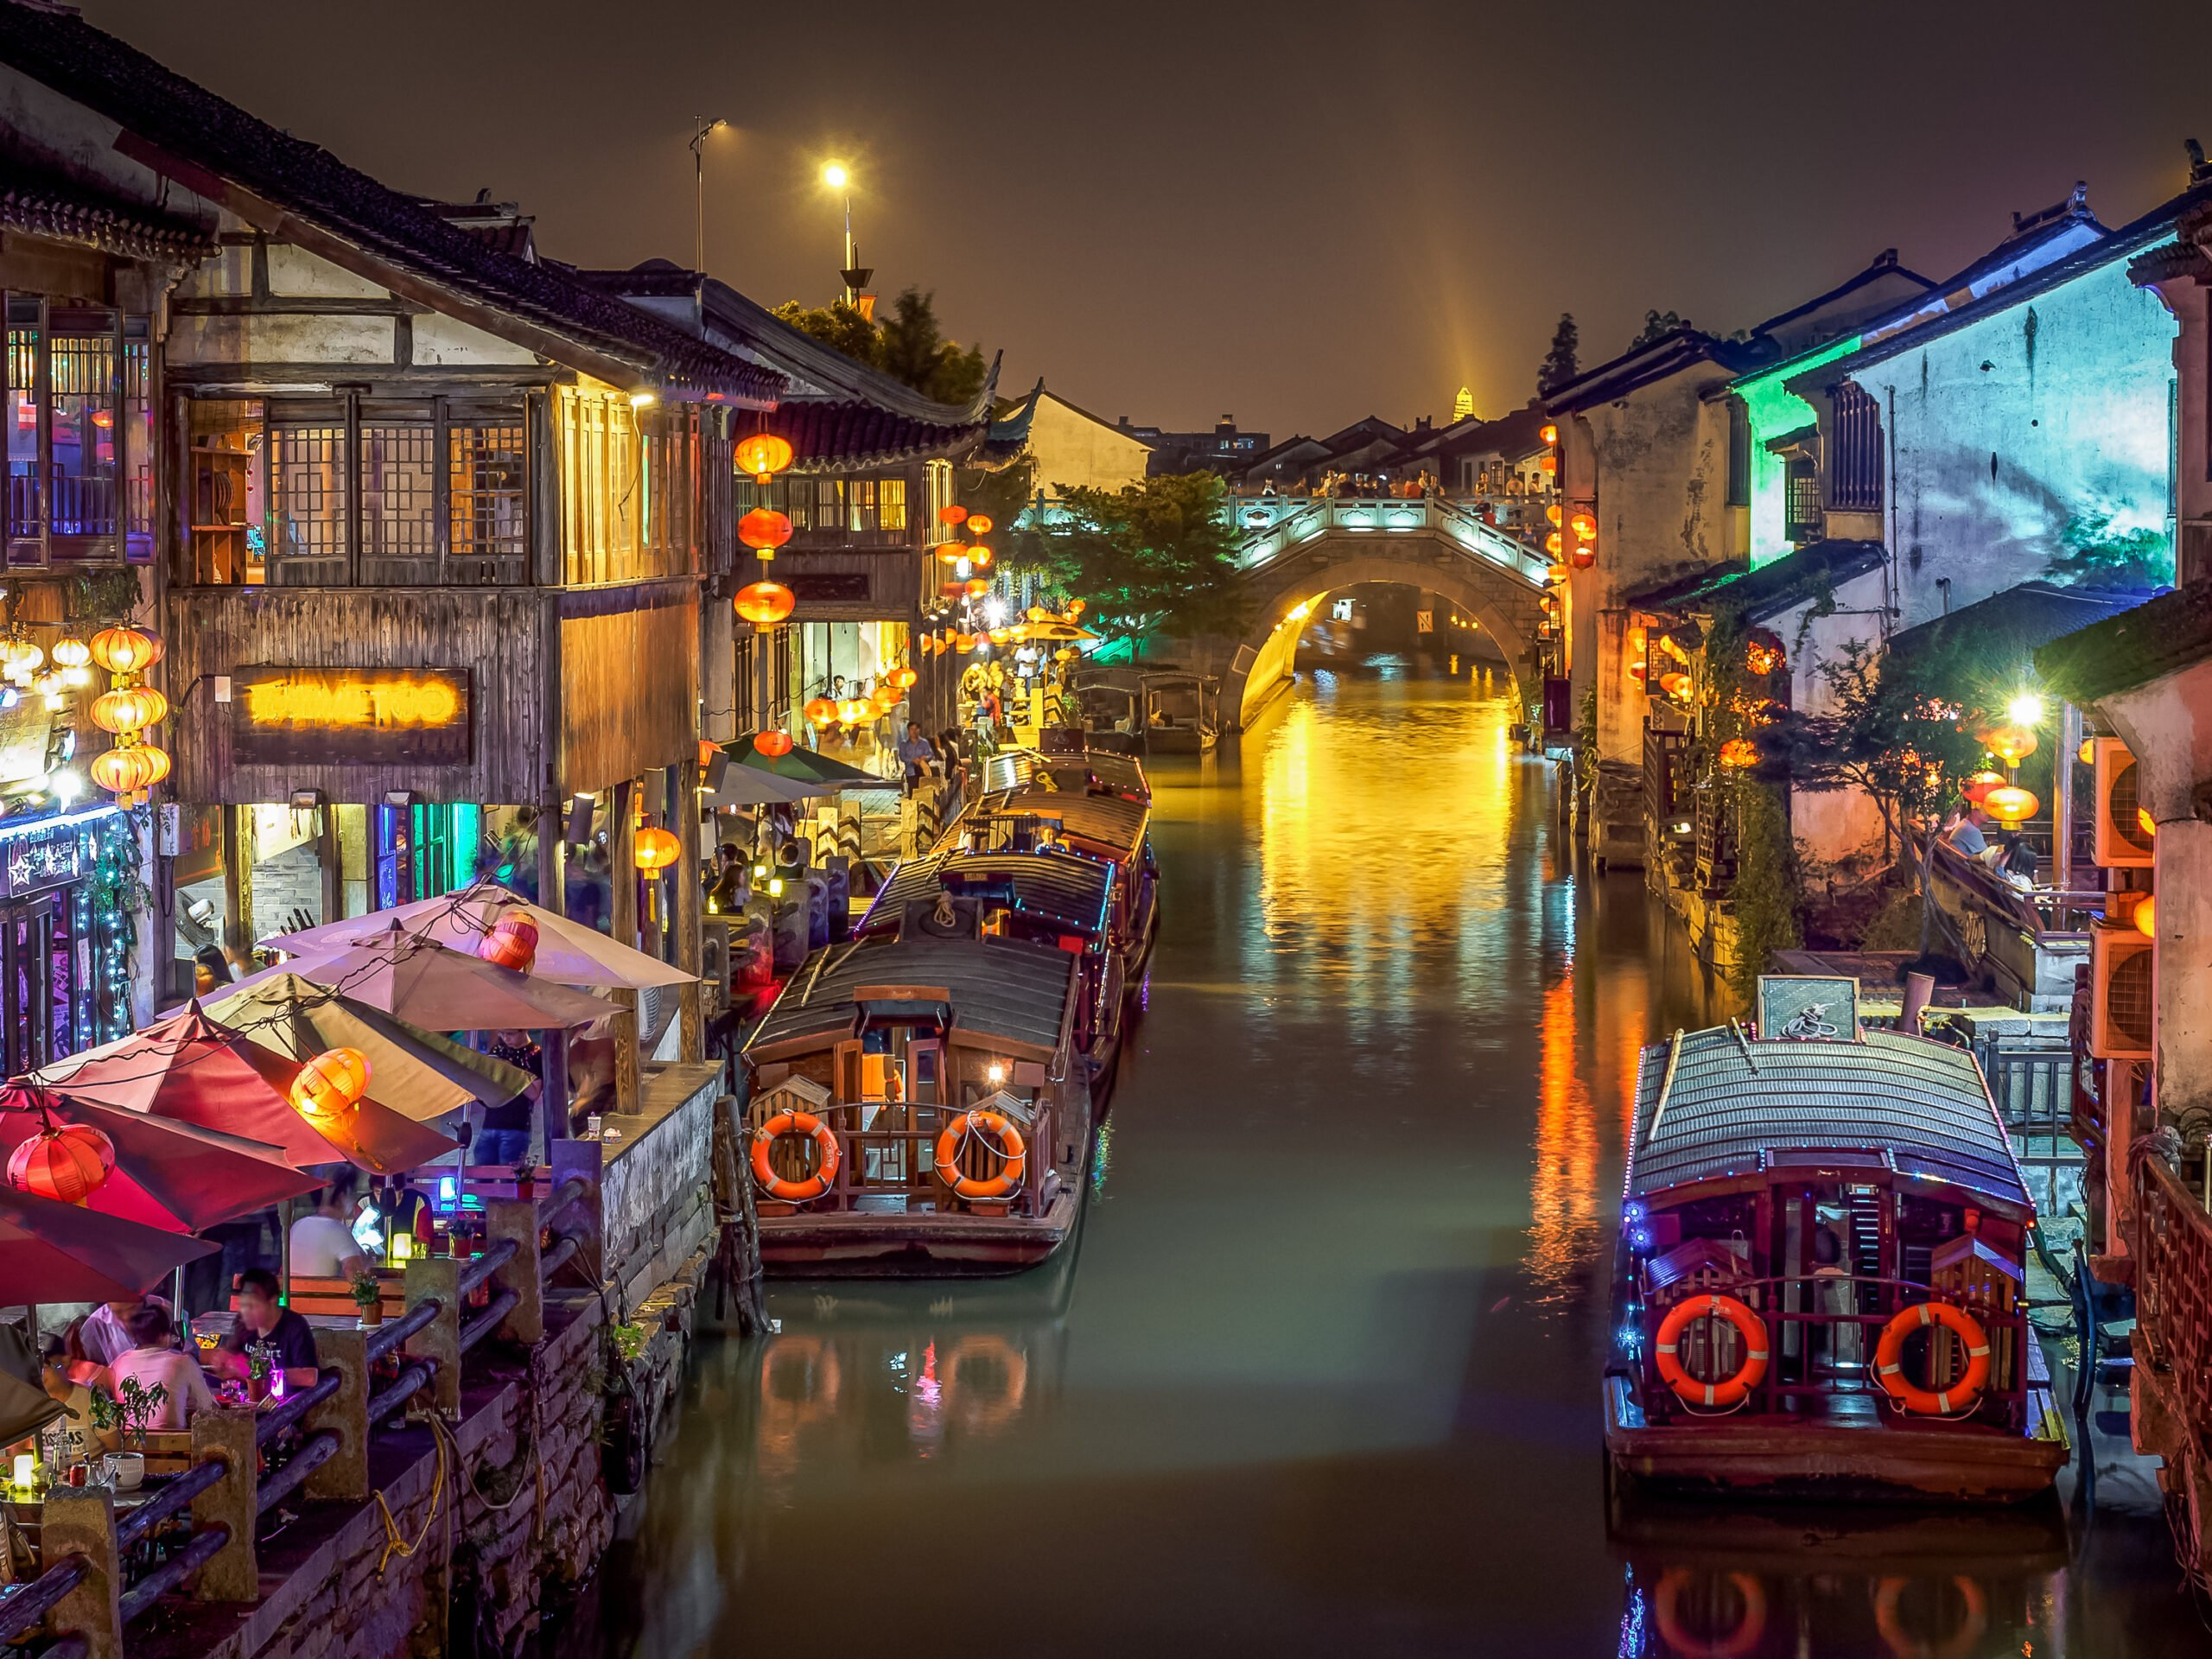 Walk Through Suzhou Alleyway In Our Suzhou Alleyway Walking Food Tour